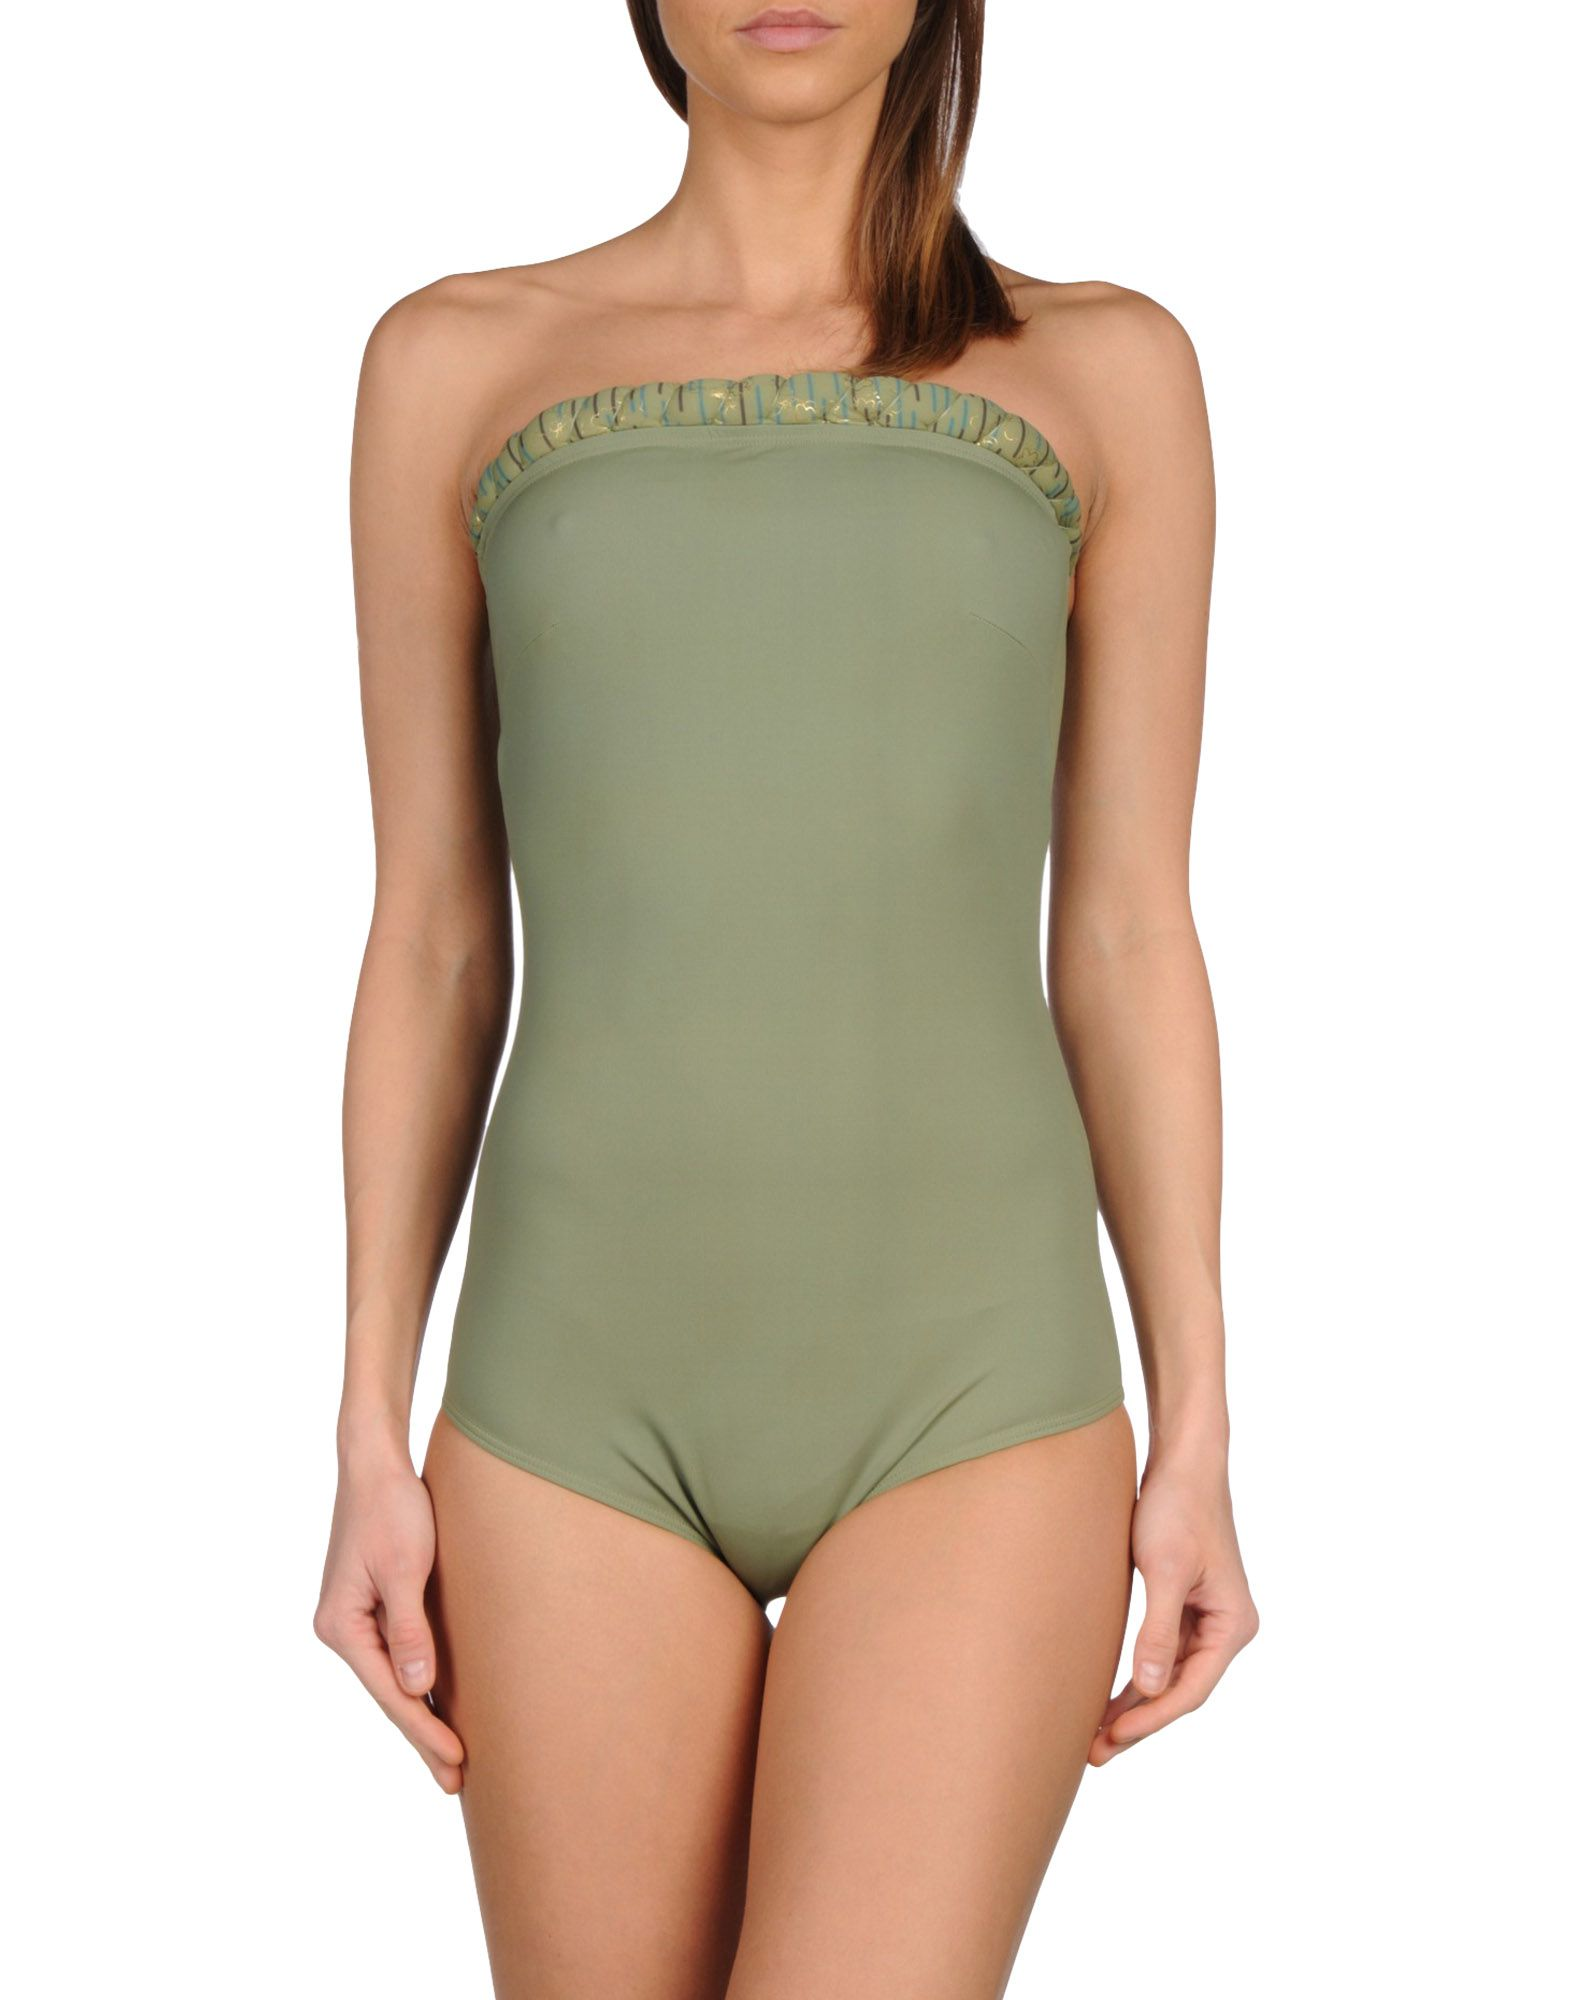 GOLDEN GOOSE DELUXE BRAND Damen Badeanzug Farbe Militärgrün Größe 5